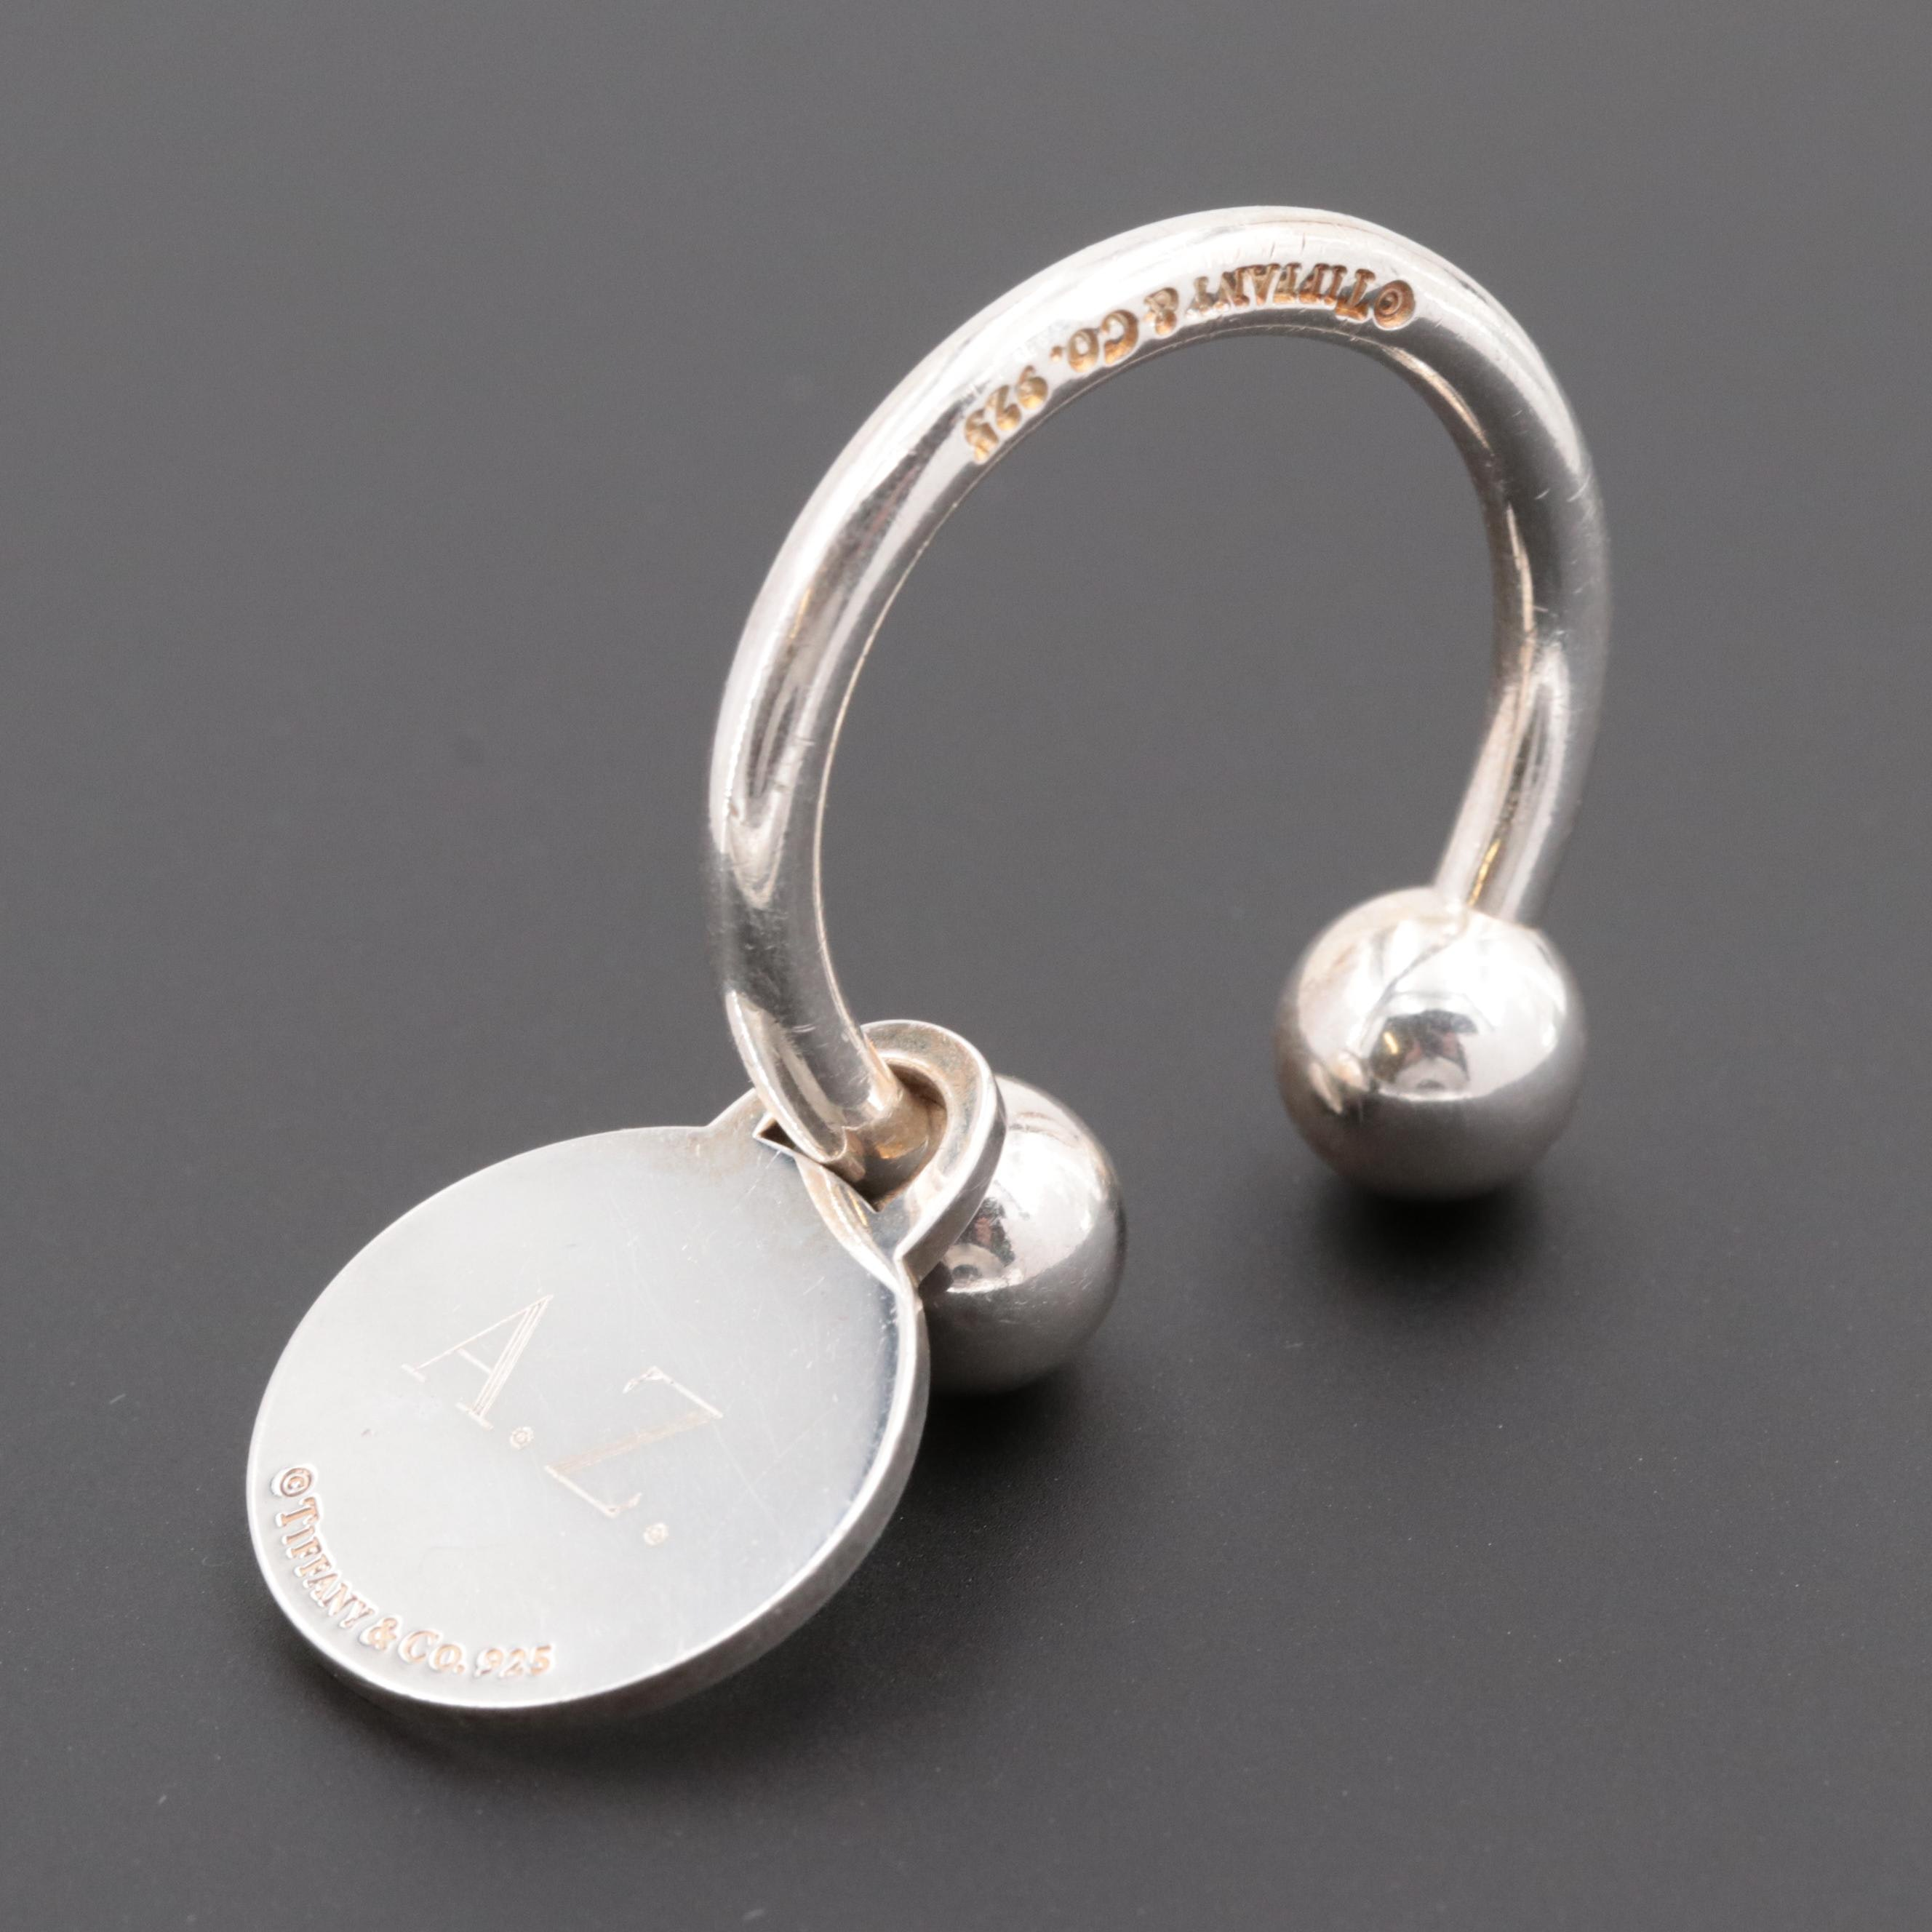 "Vintage Tiffany & Co. Sterling Silver ""Return to Tiffany"" Round Tag Key Ring"